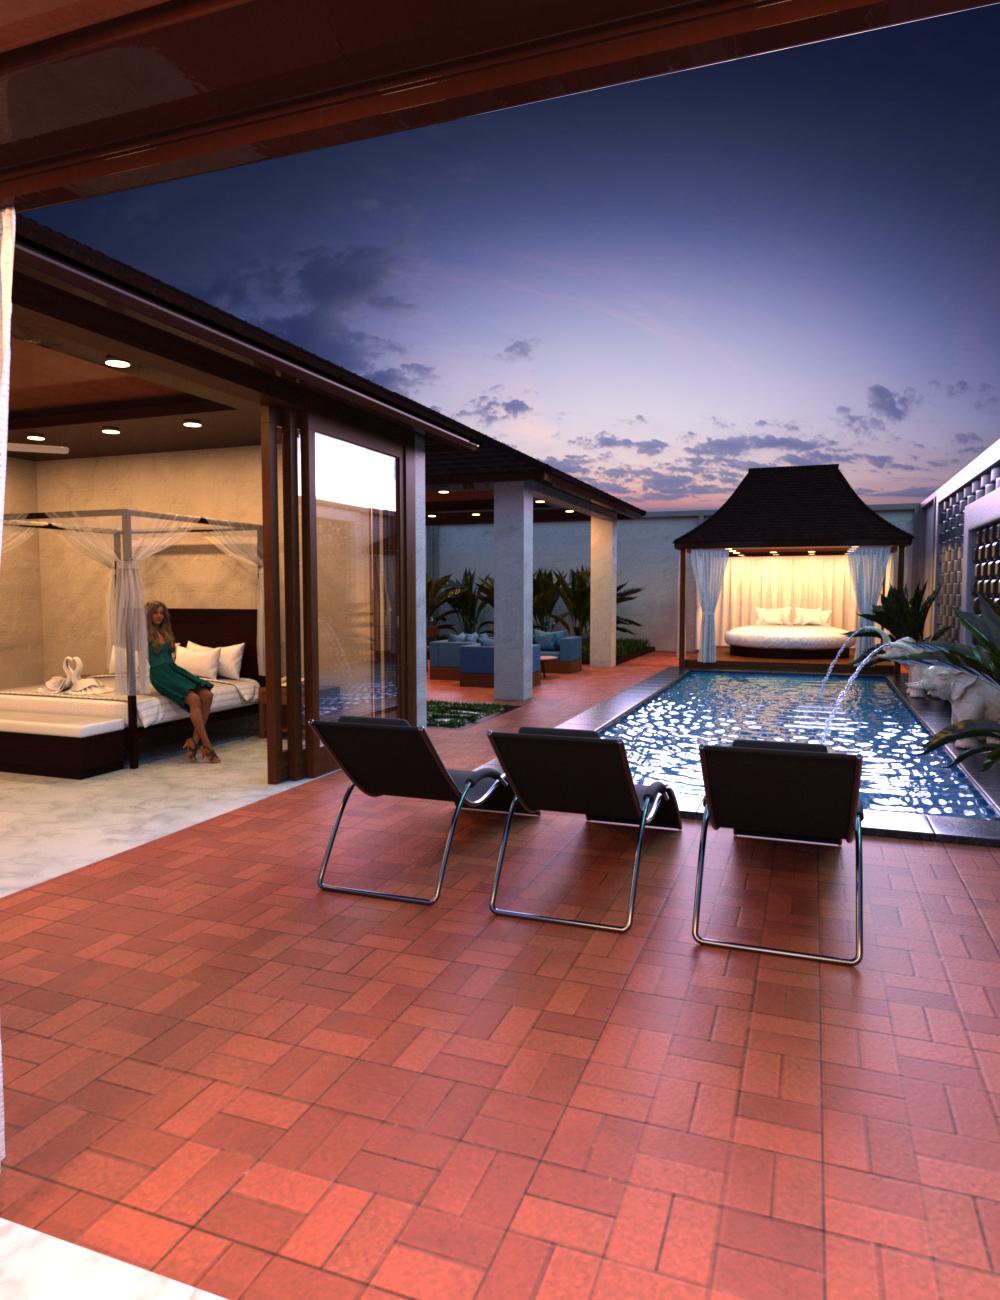 Pool Villa by: Charlie, 3D Models by Daz 3D